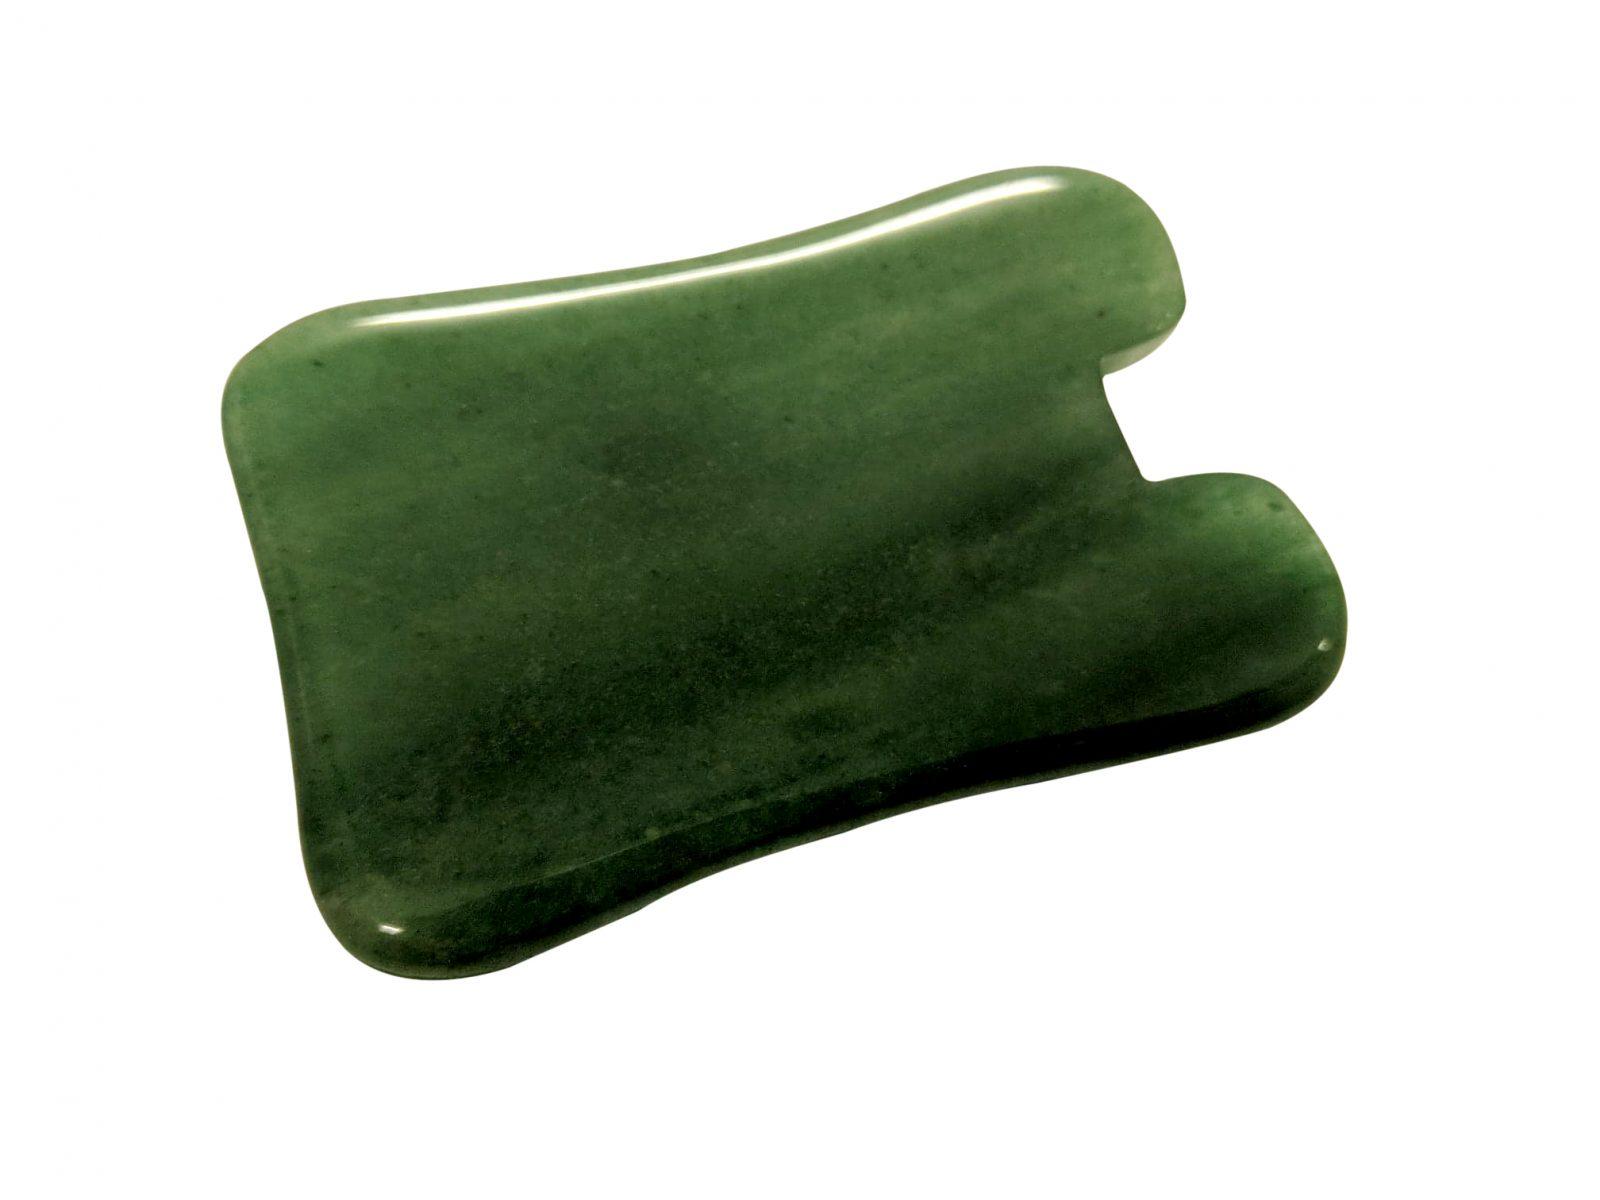 Gua Sha - Jade Massage Tool